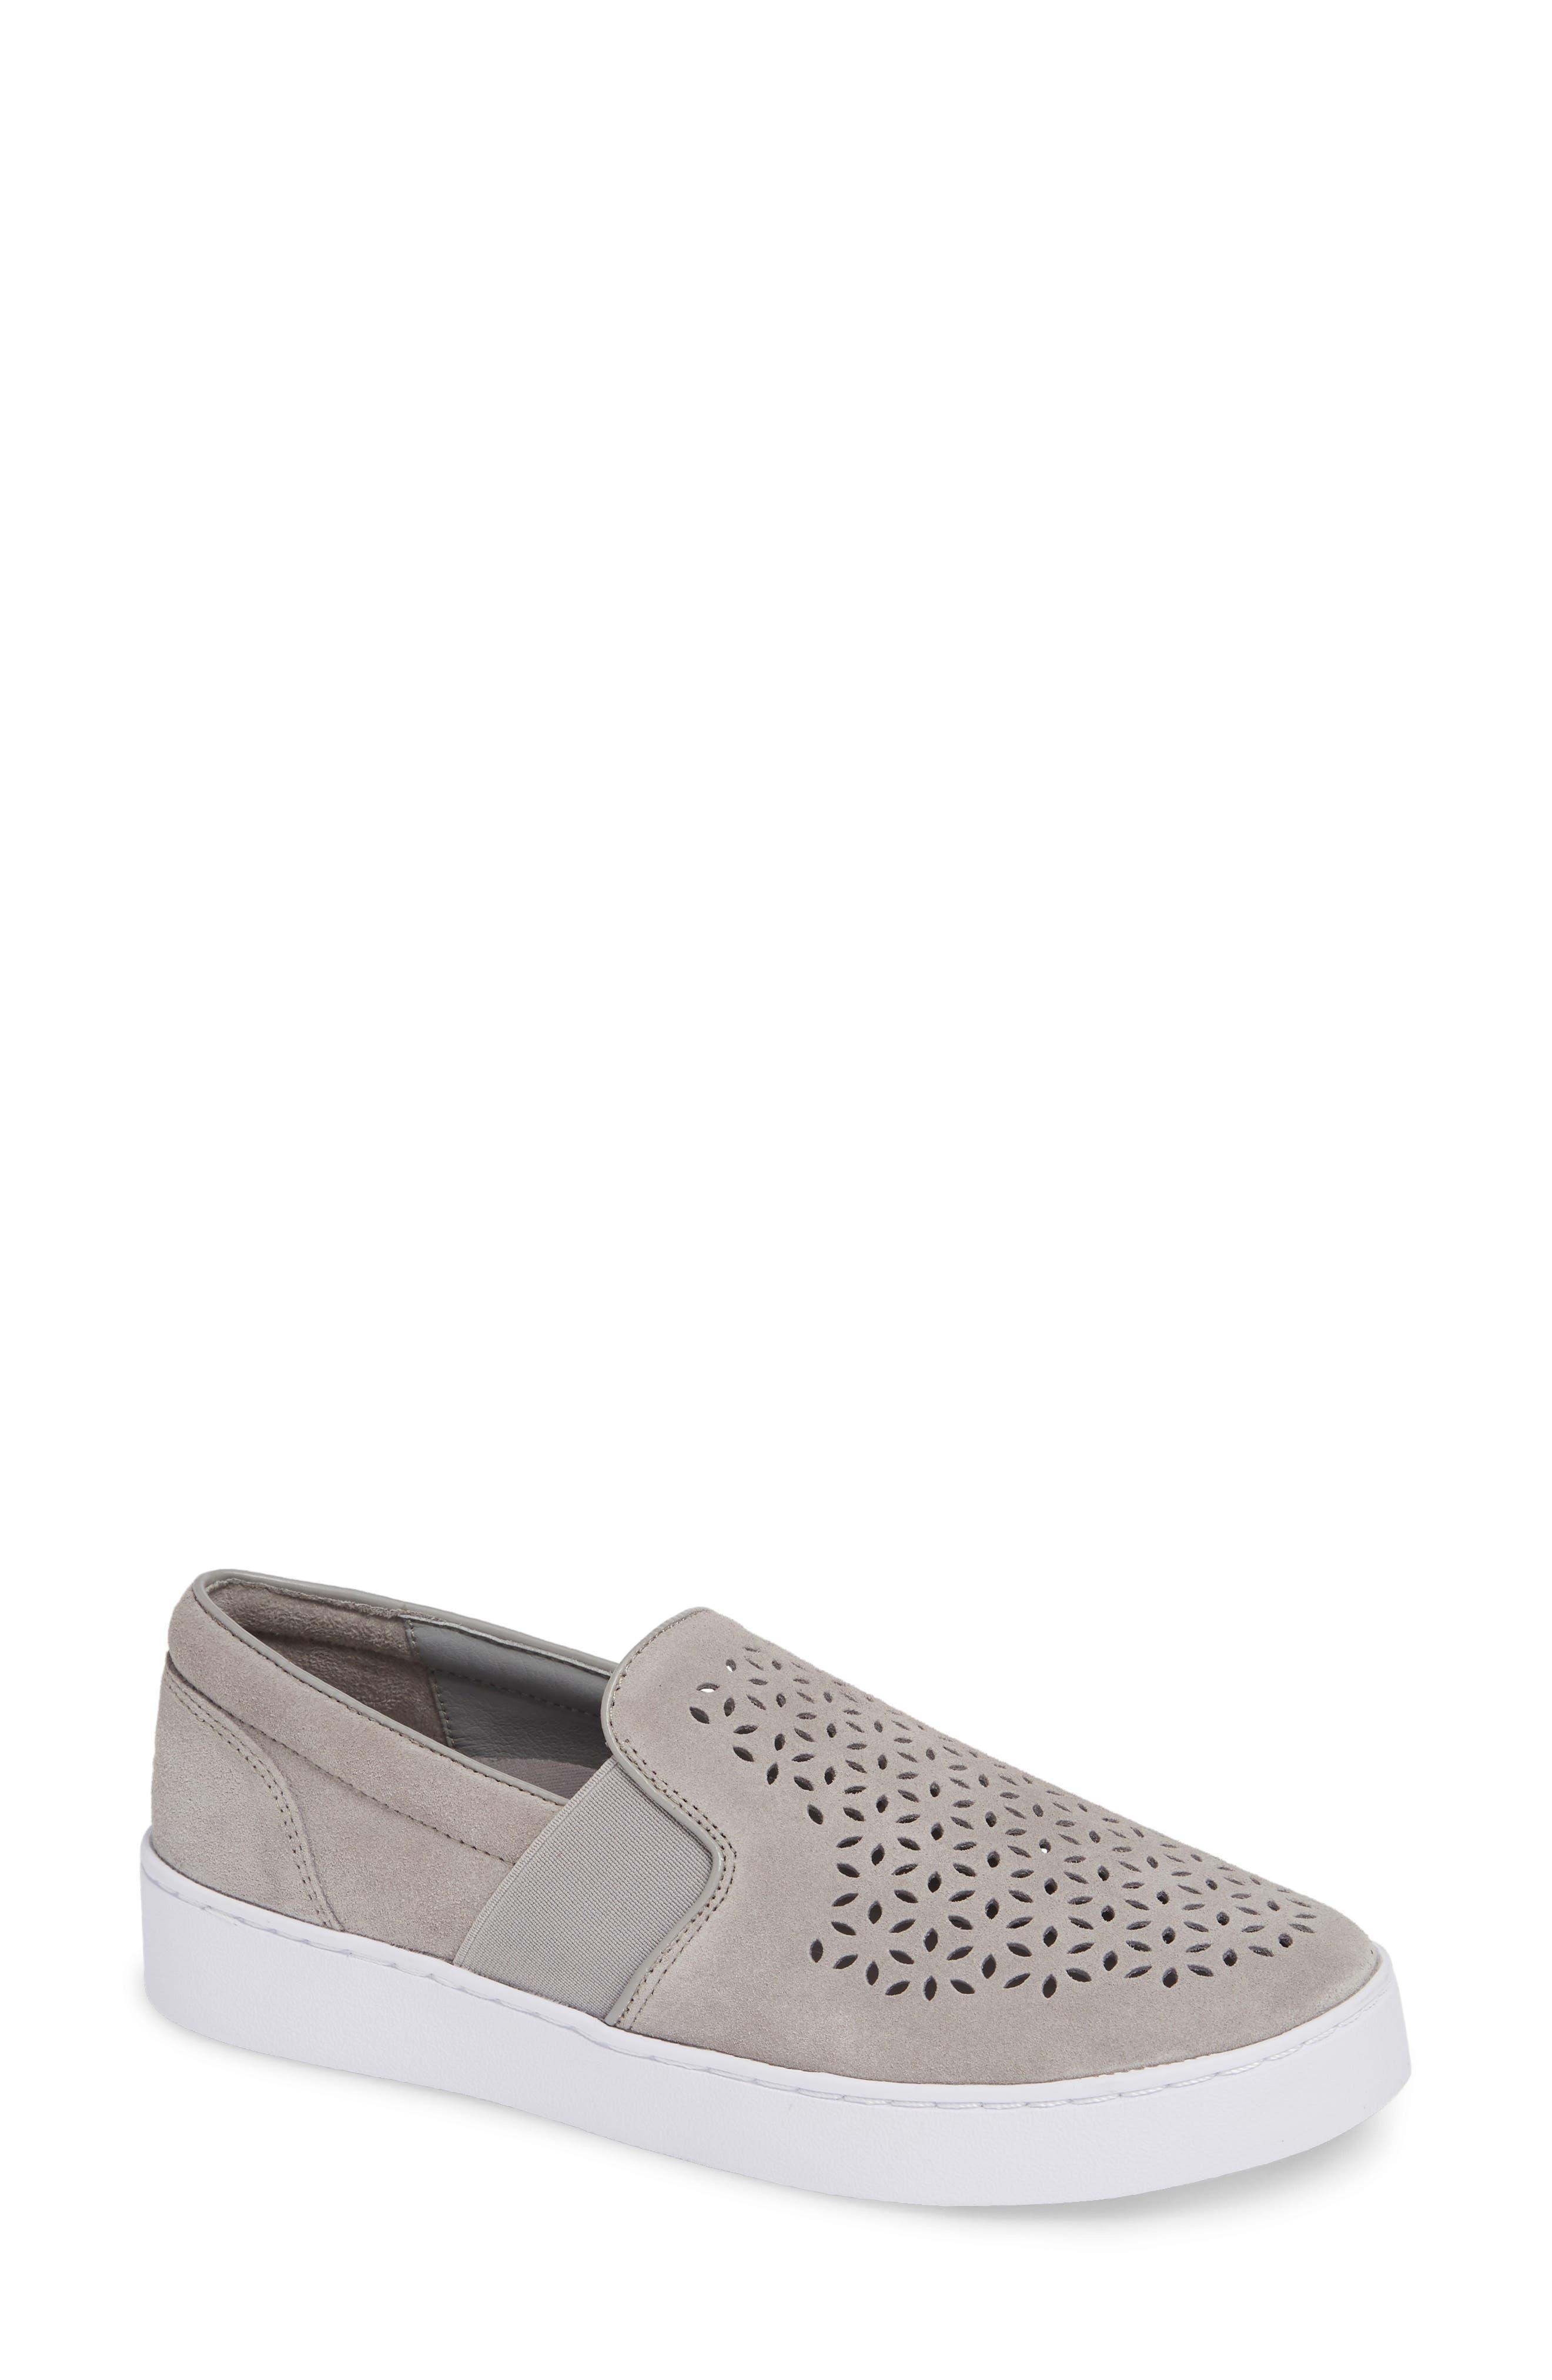 Vionic Kani Perforated Slip-On Sneaker, Grey